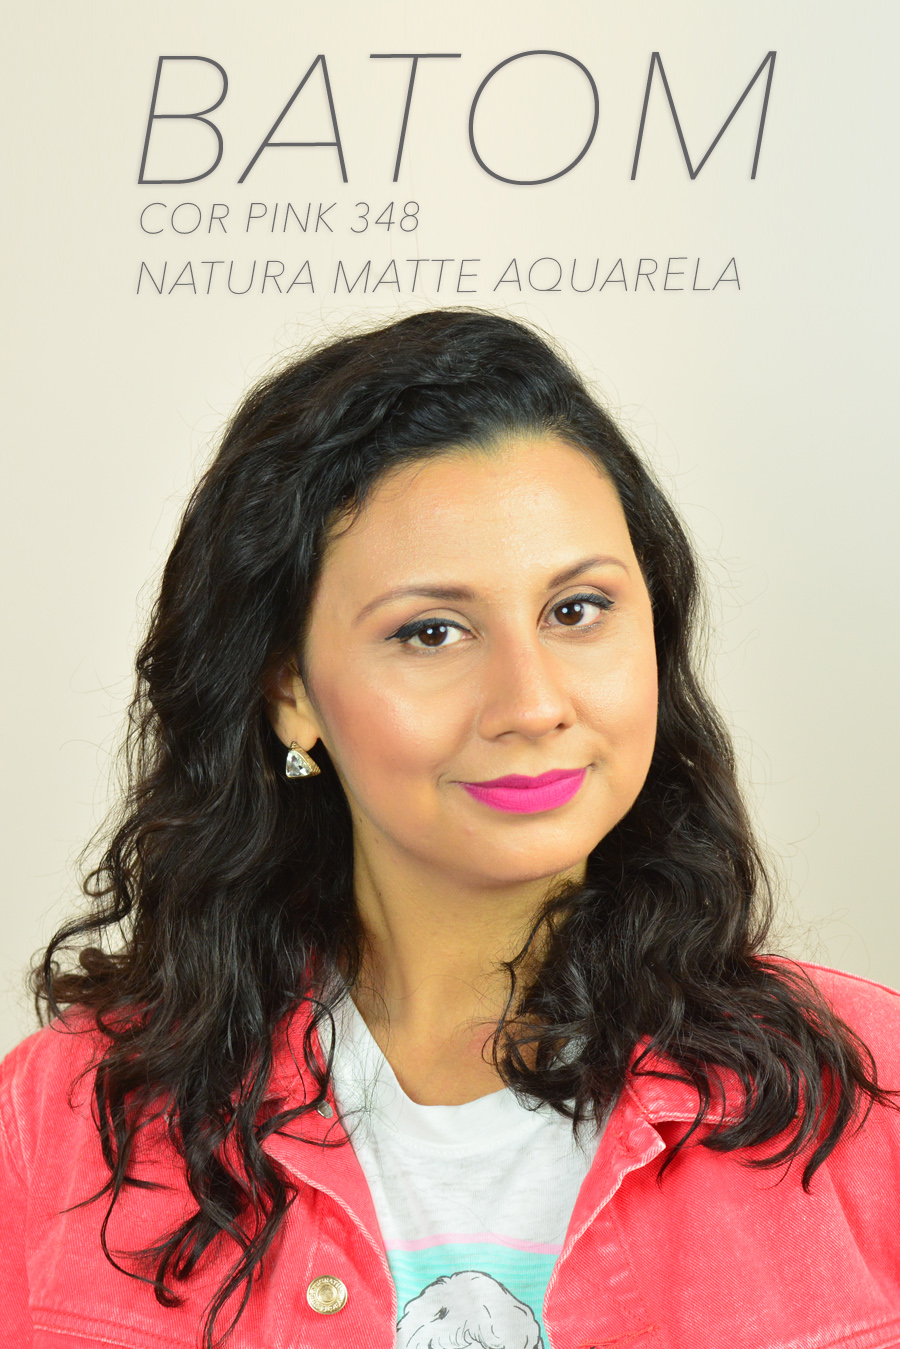 Novos Batons Natura Aquarela Matte - Cor Pink